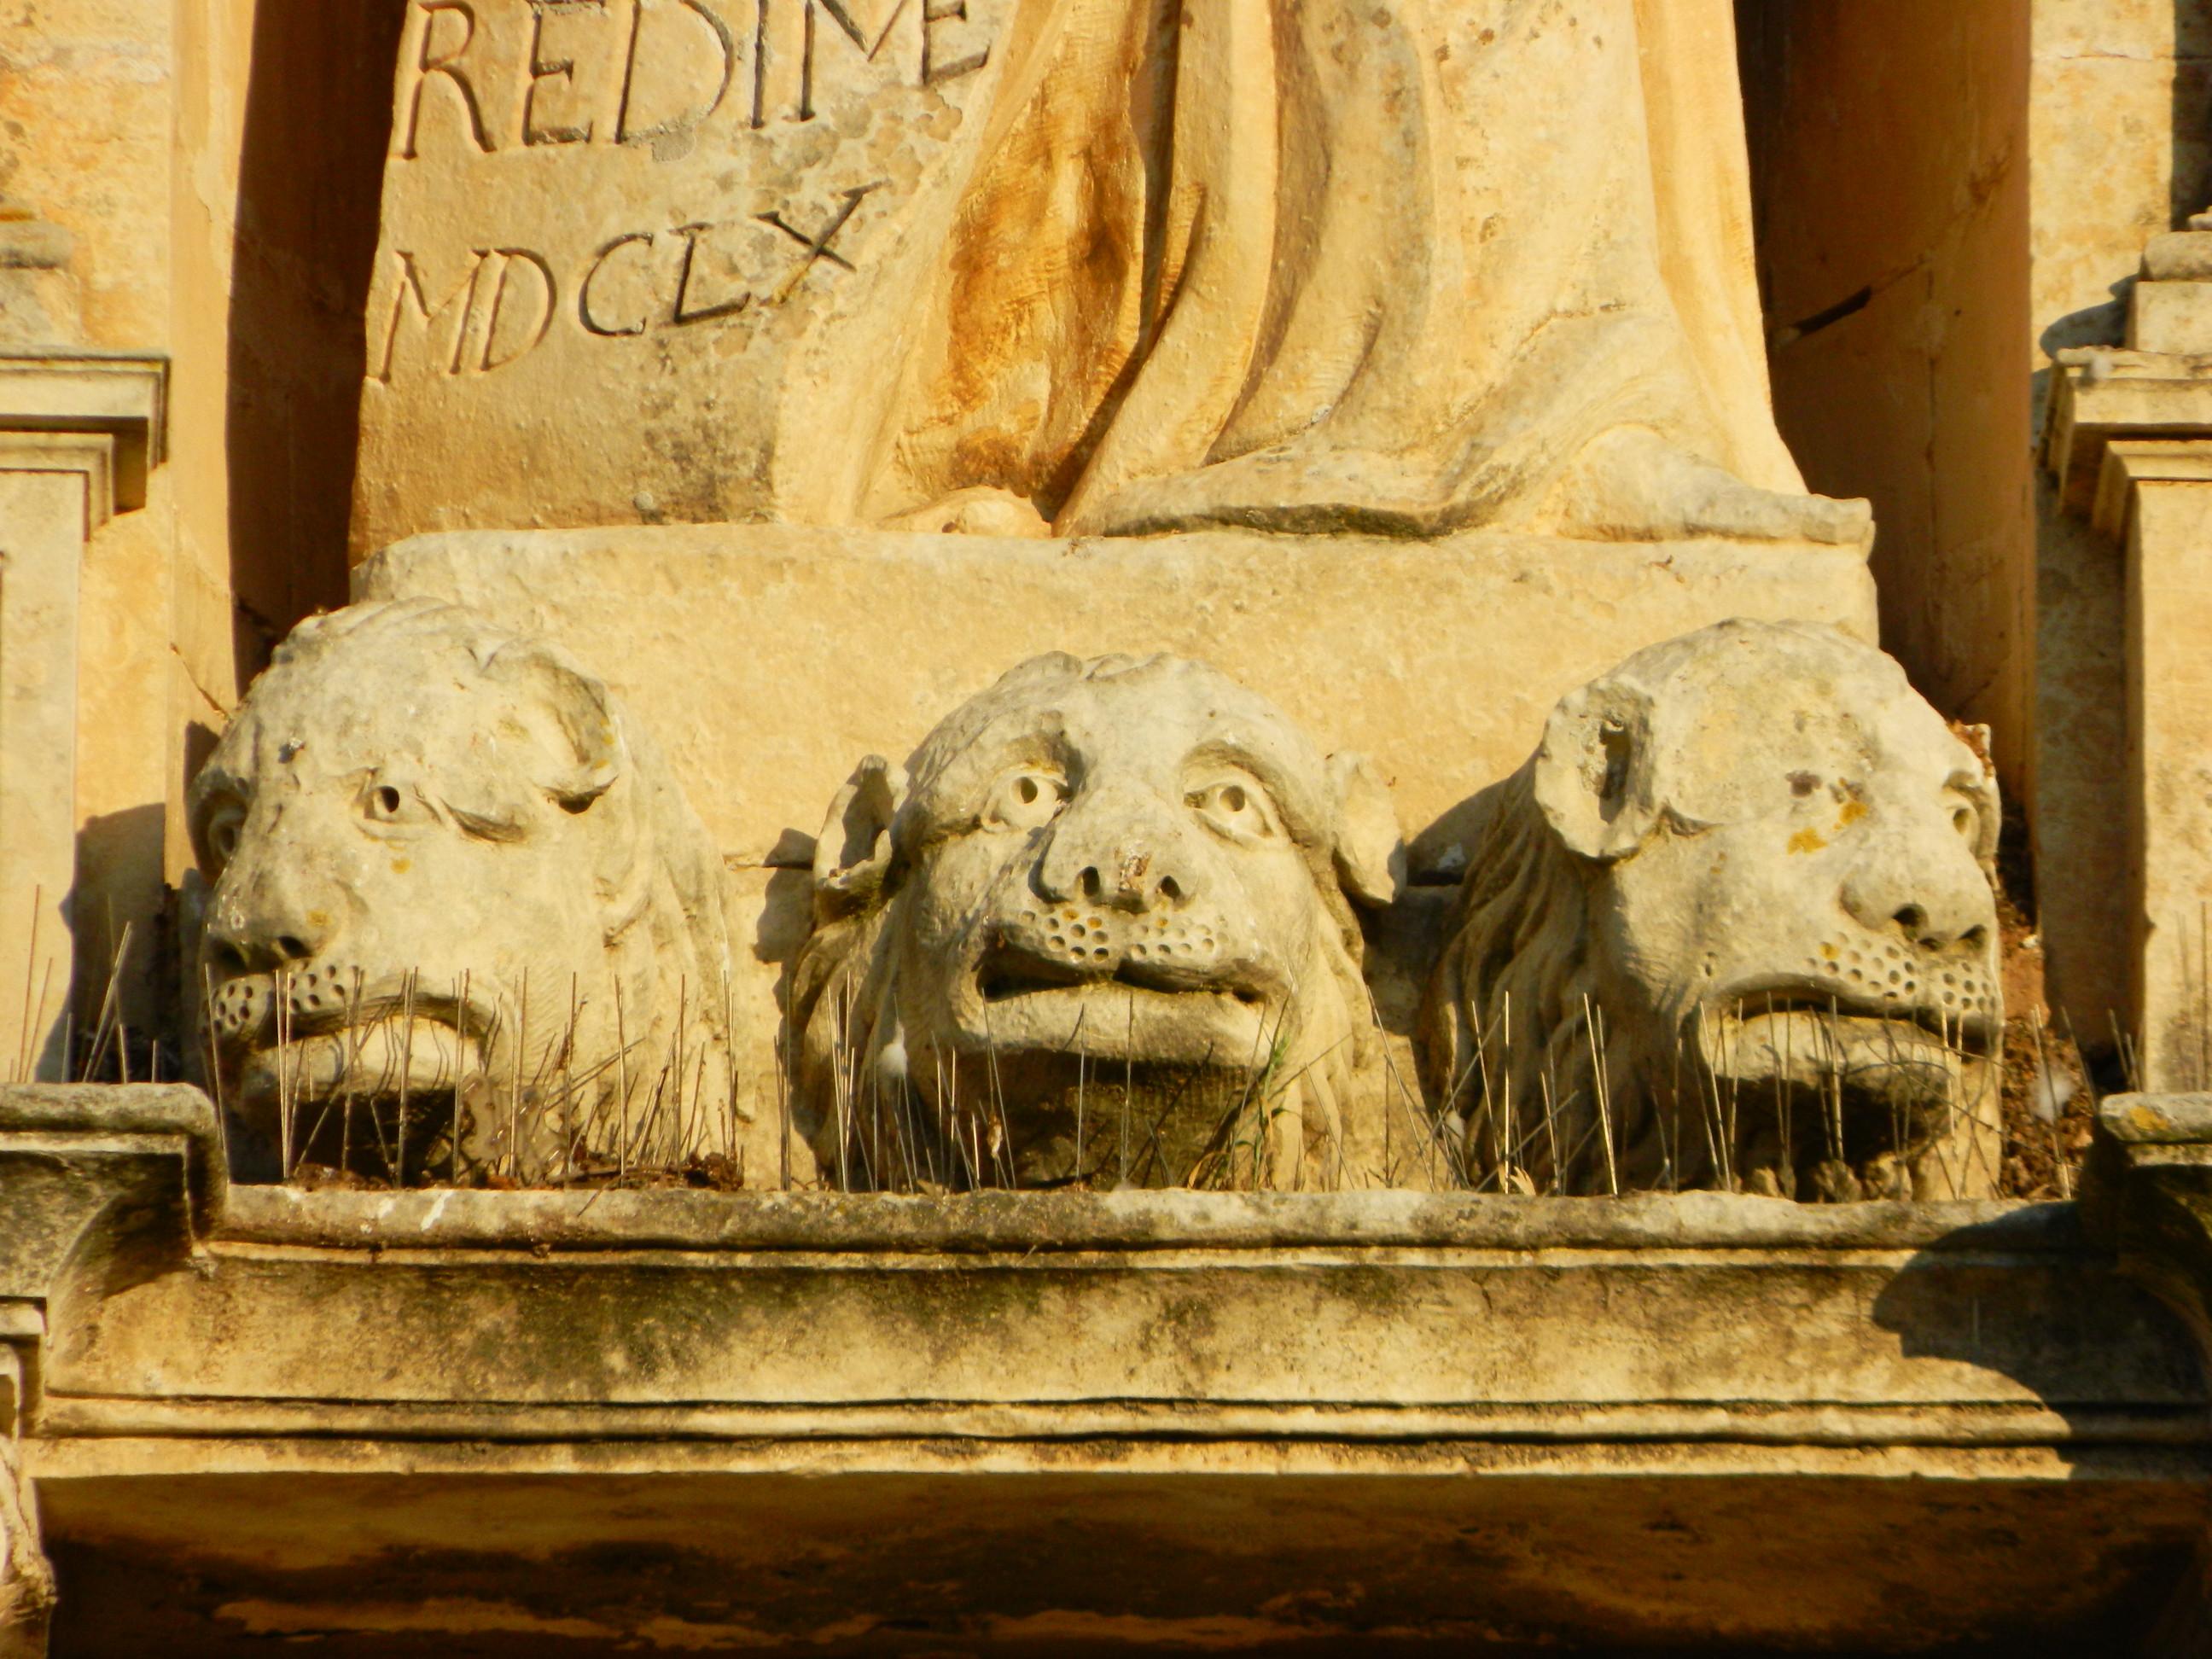 STREET SHRINES: The Statue of Daniel on Daniel'sHouse